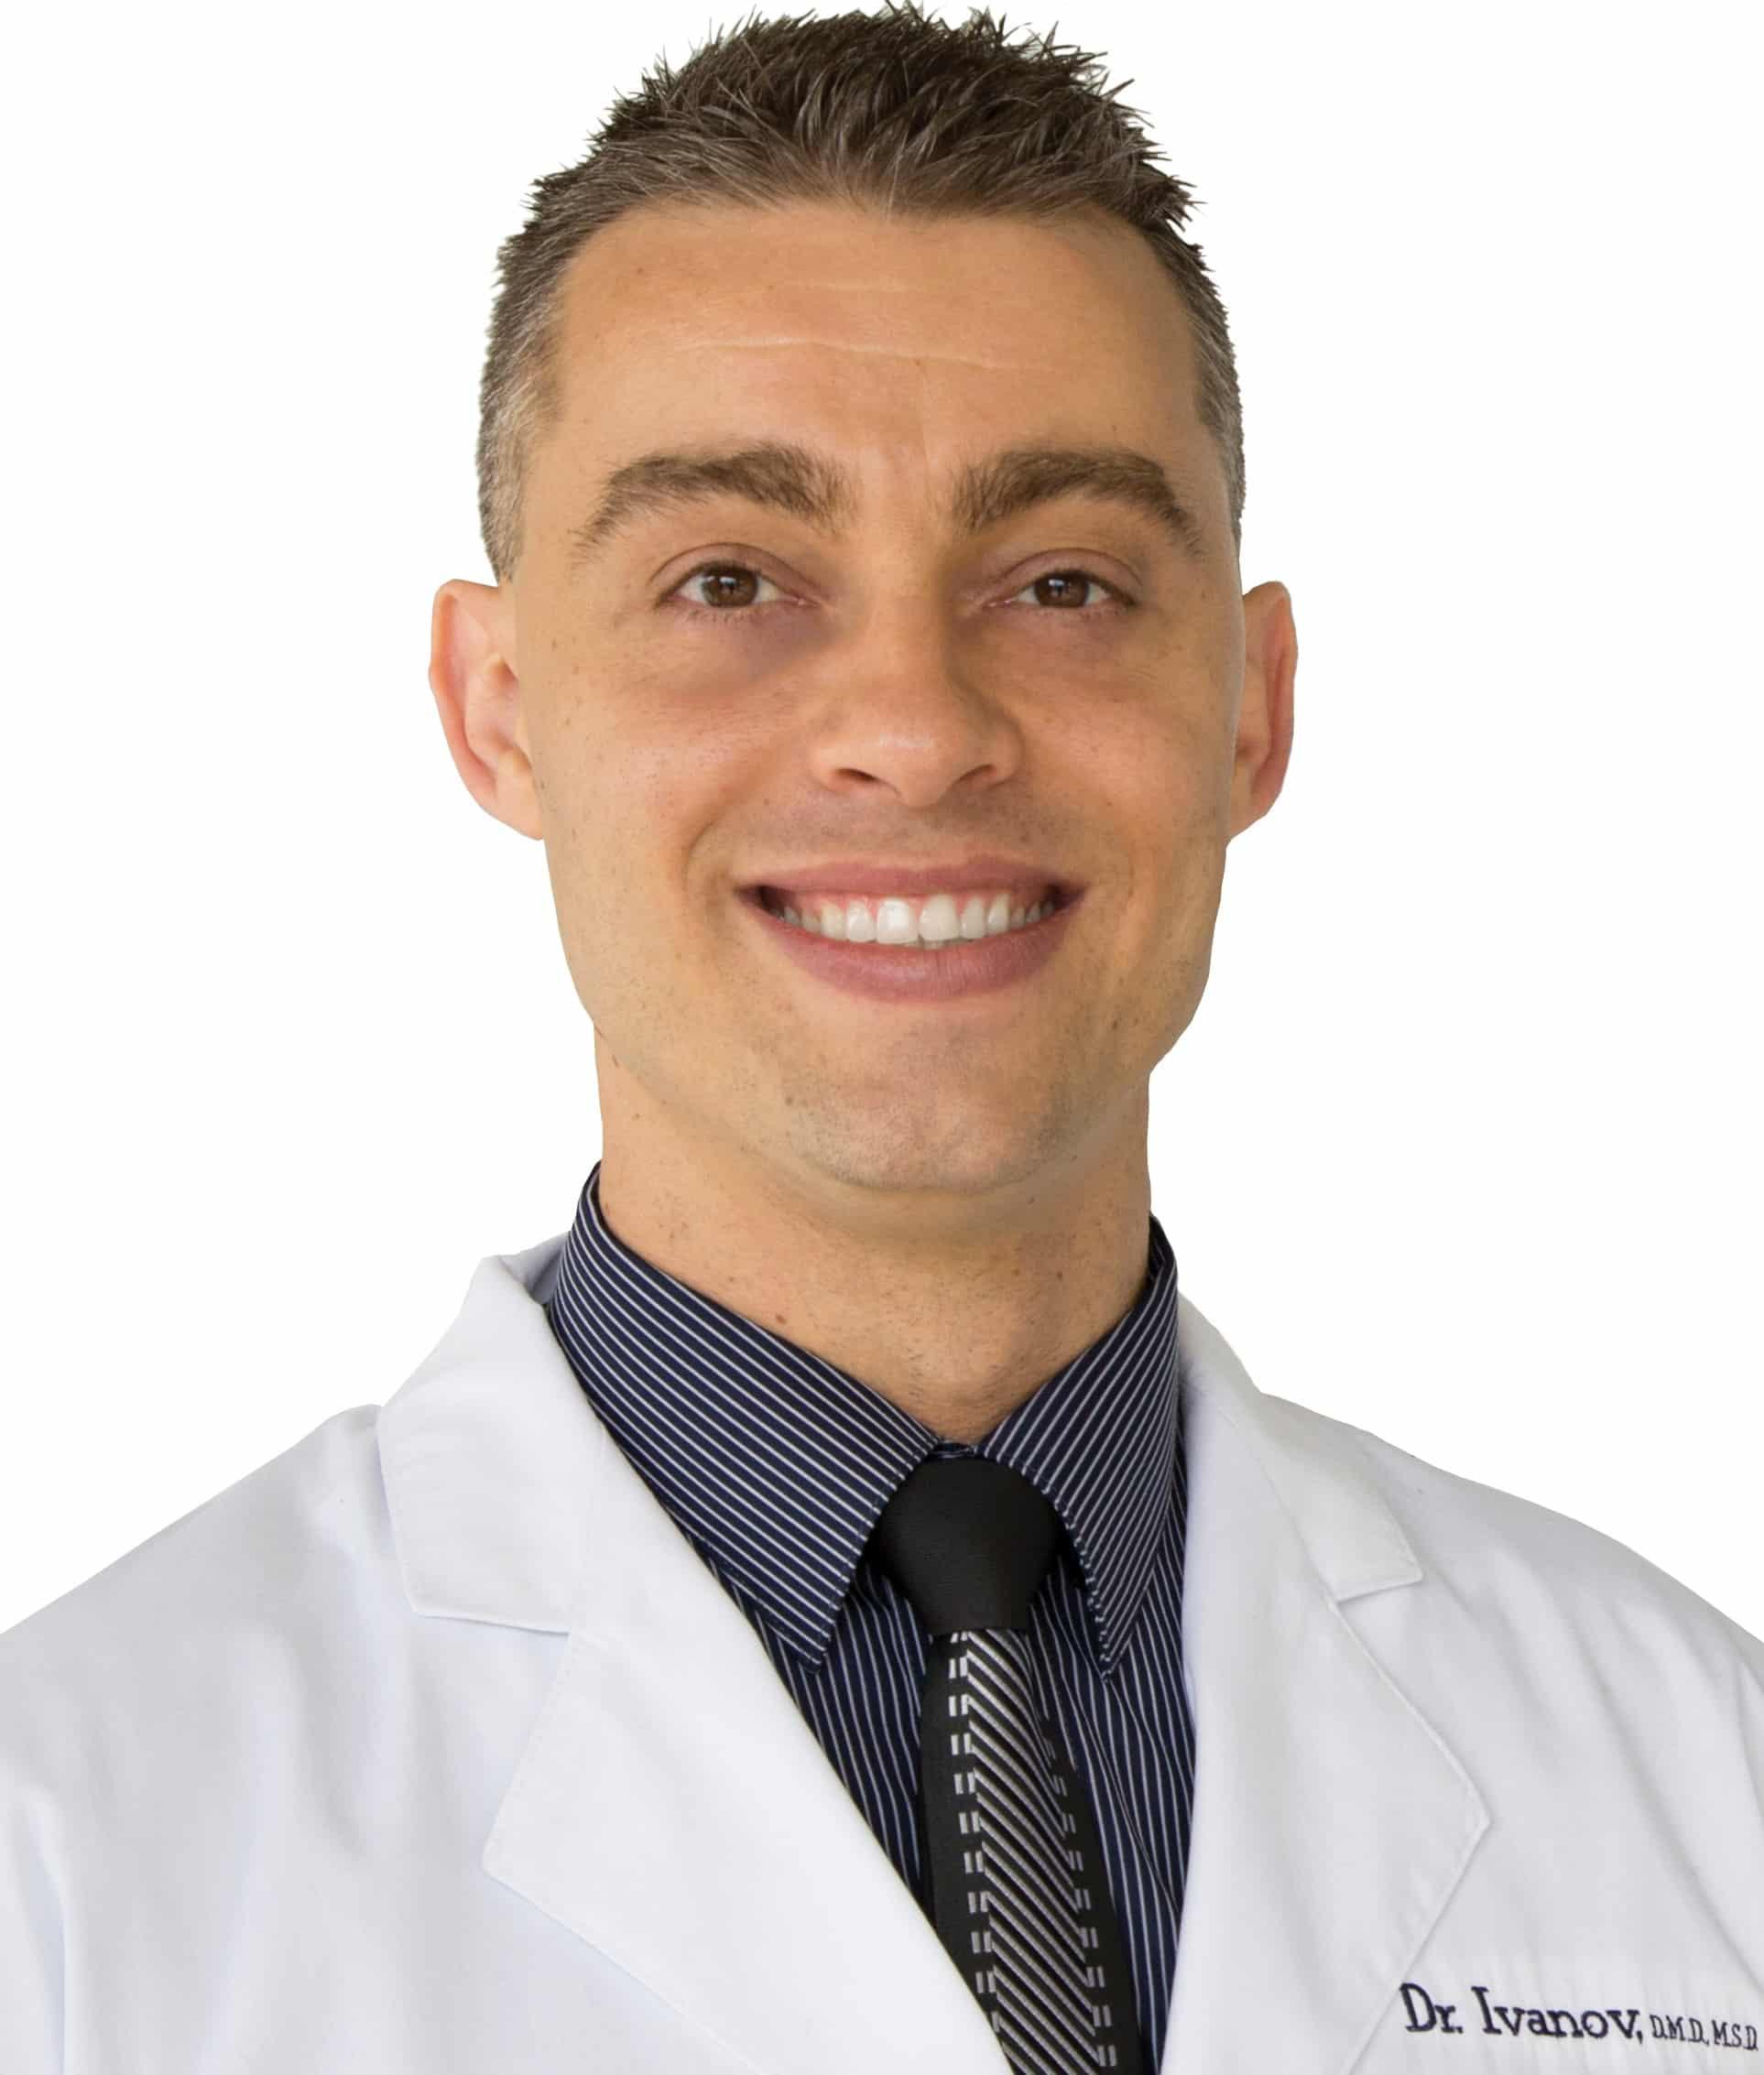 Dr.-Ivanov-orthodontist-near me for braces at IVANOV Orthodontic Experts